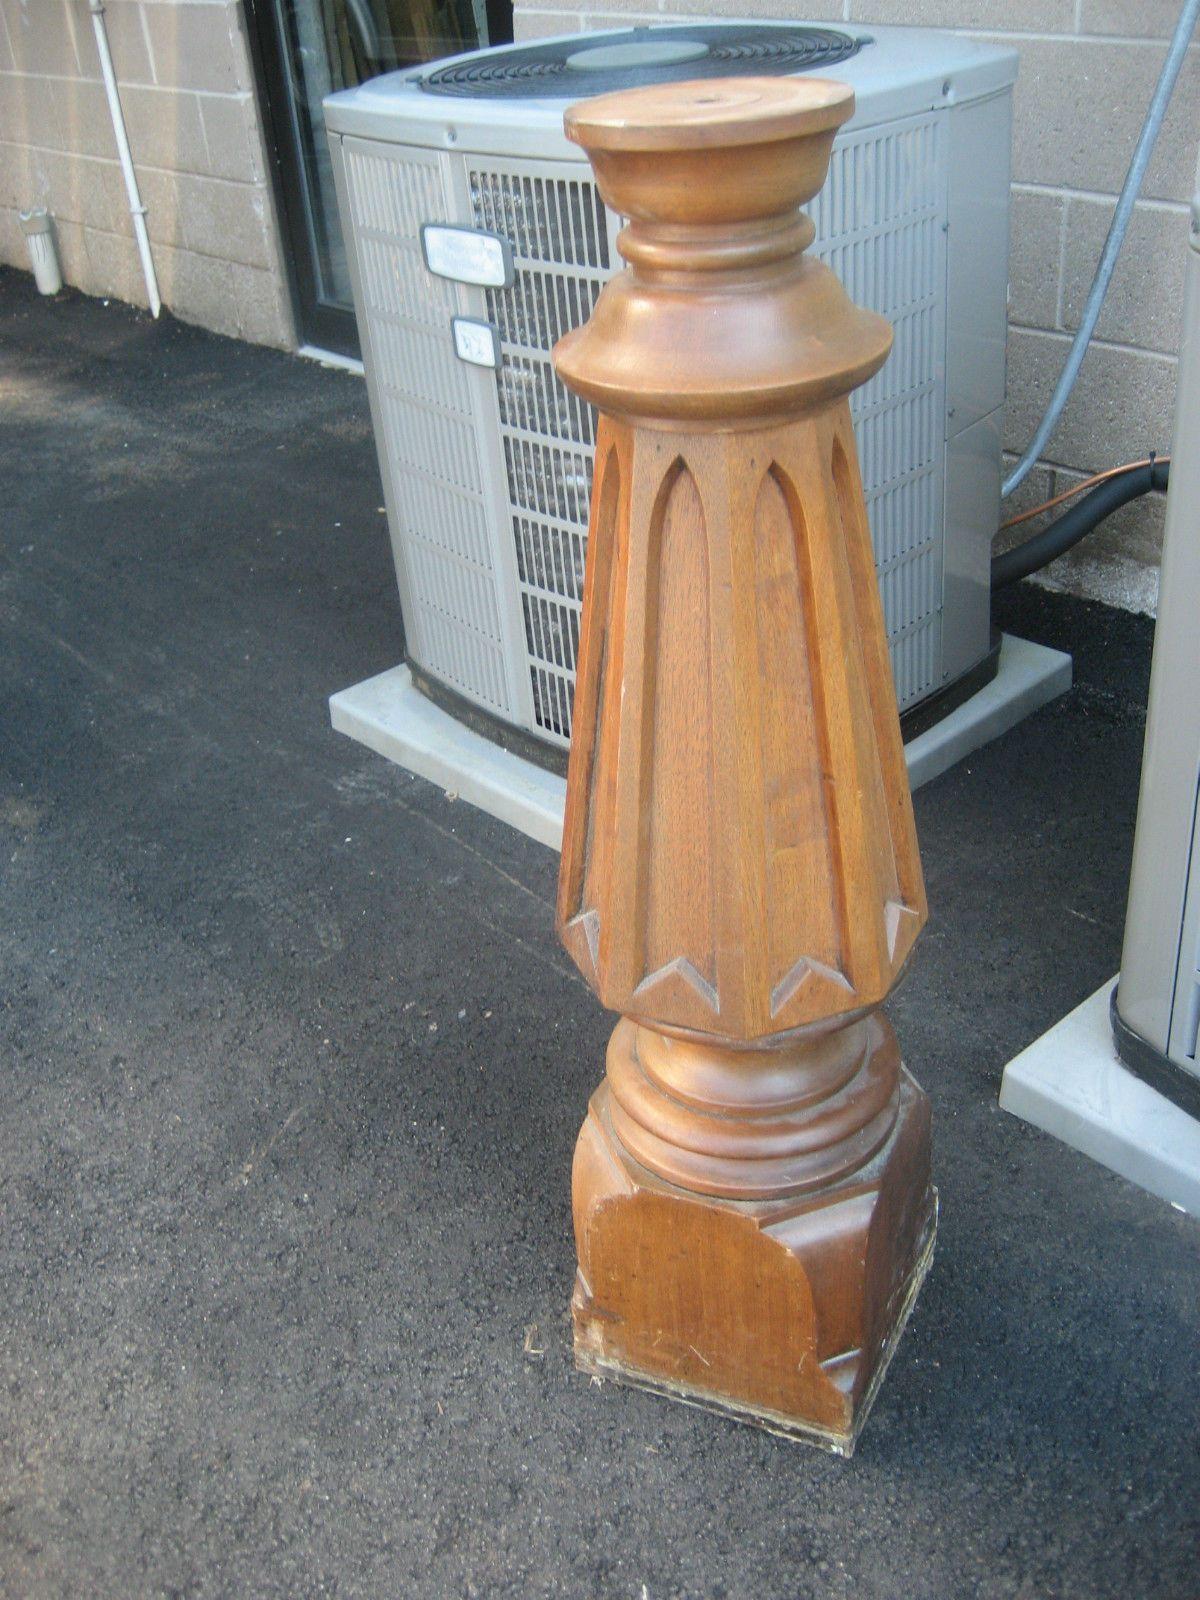 Circa 1860 70 Victorian Black Walnut Stair Railing W Balusters Amp Newel Post Stair Railing Stairs Newel Posts